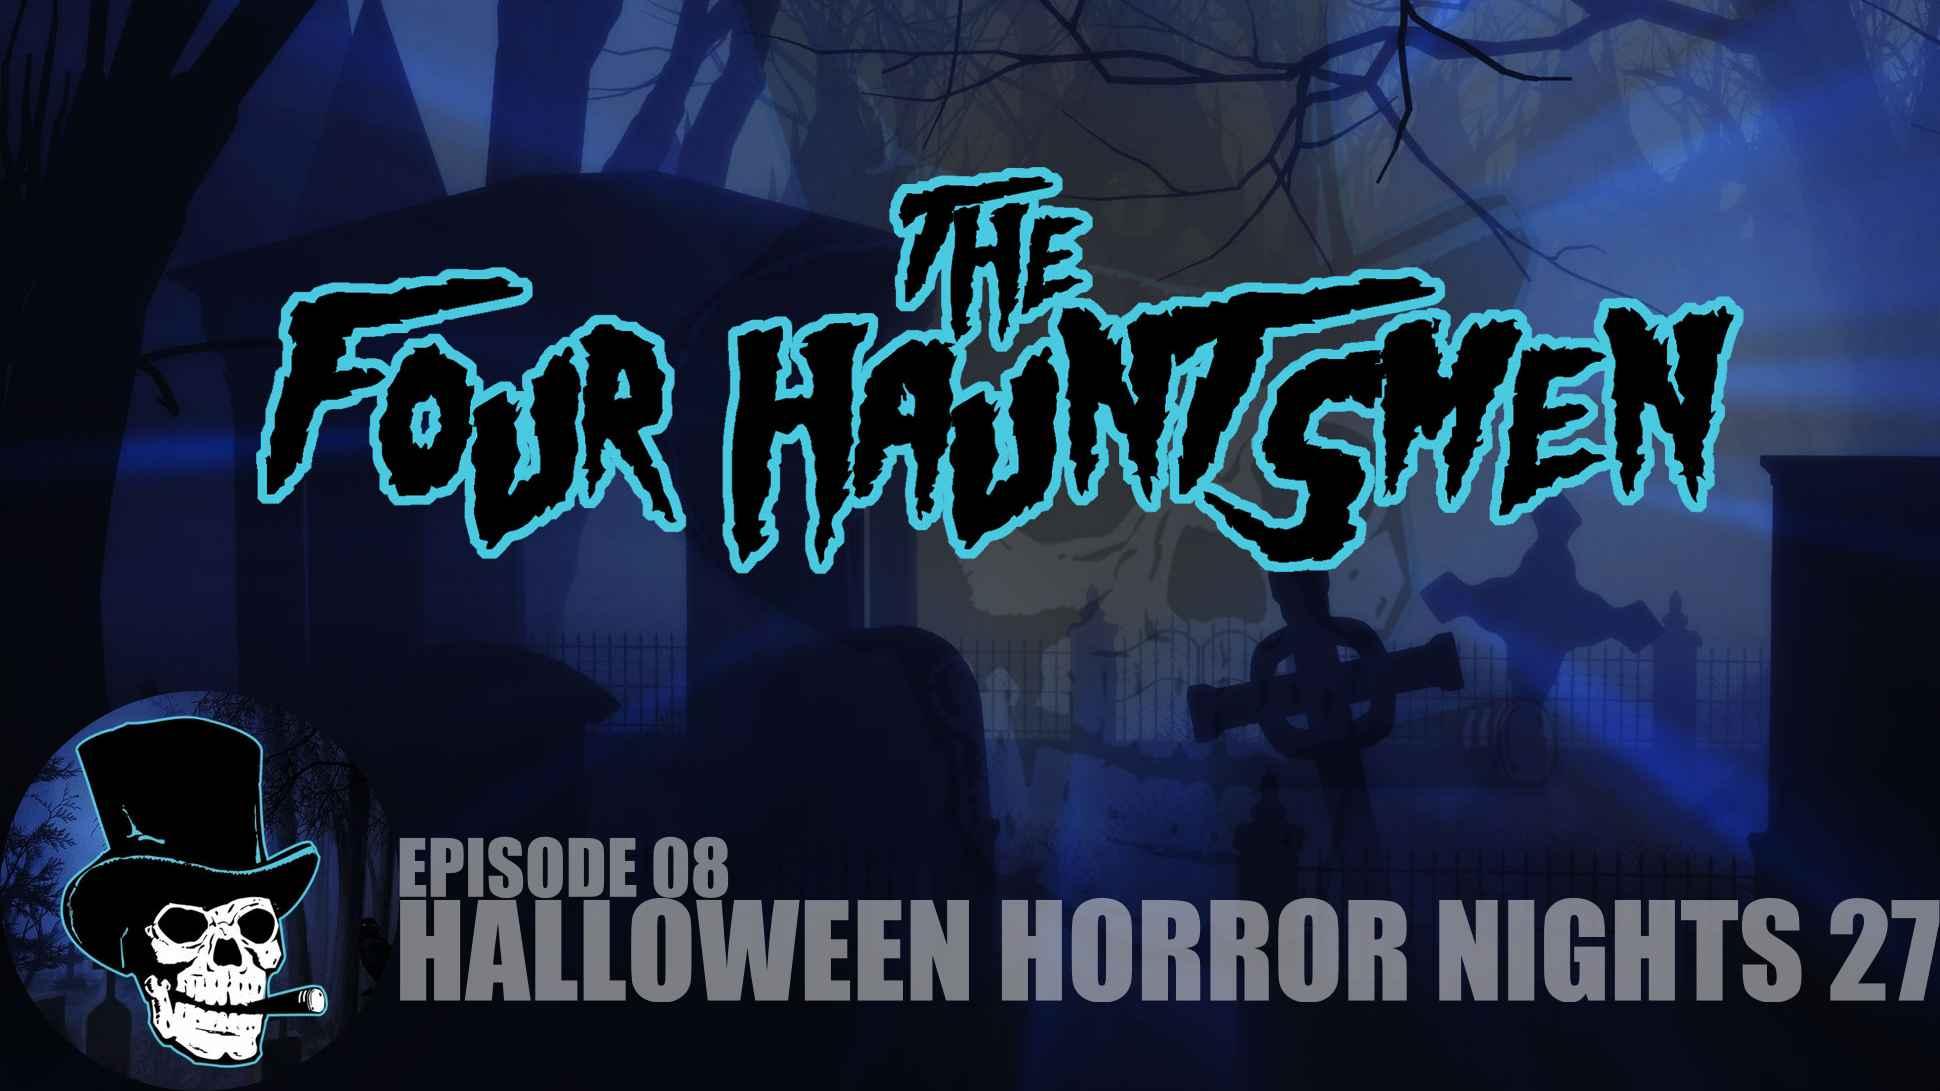 The Four Hauntsmen Hhn27 Halloween Horror Nights 2017